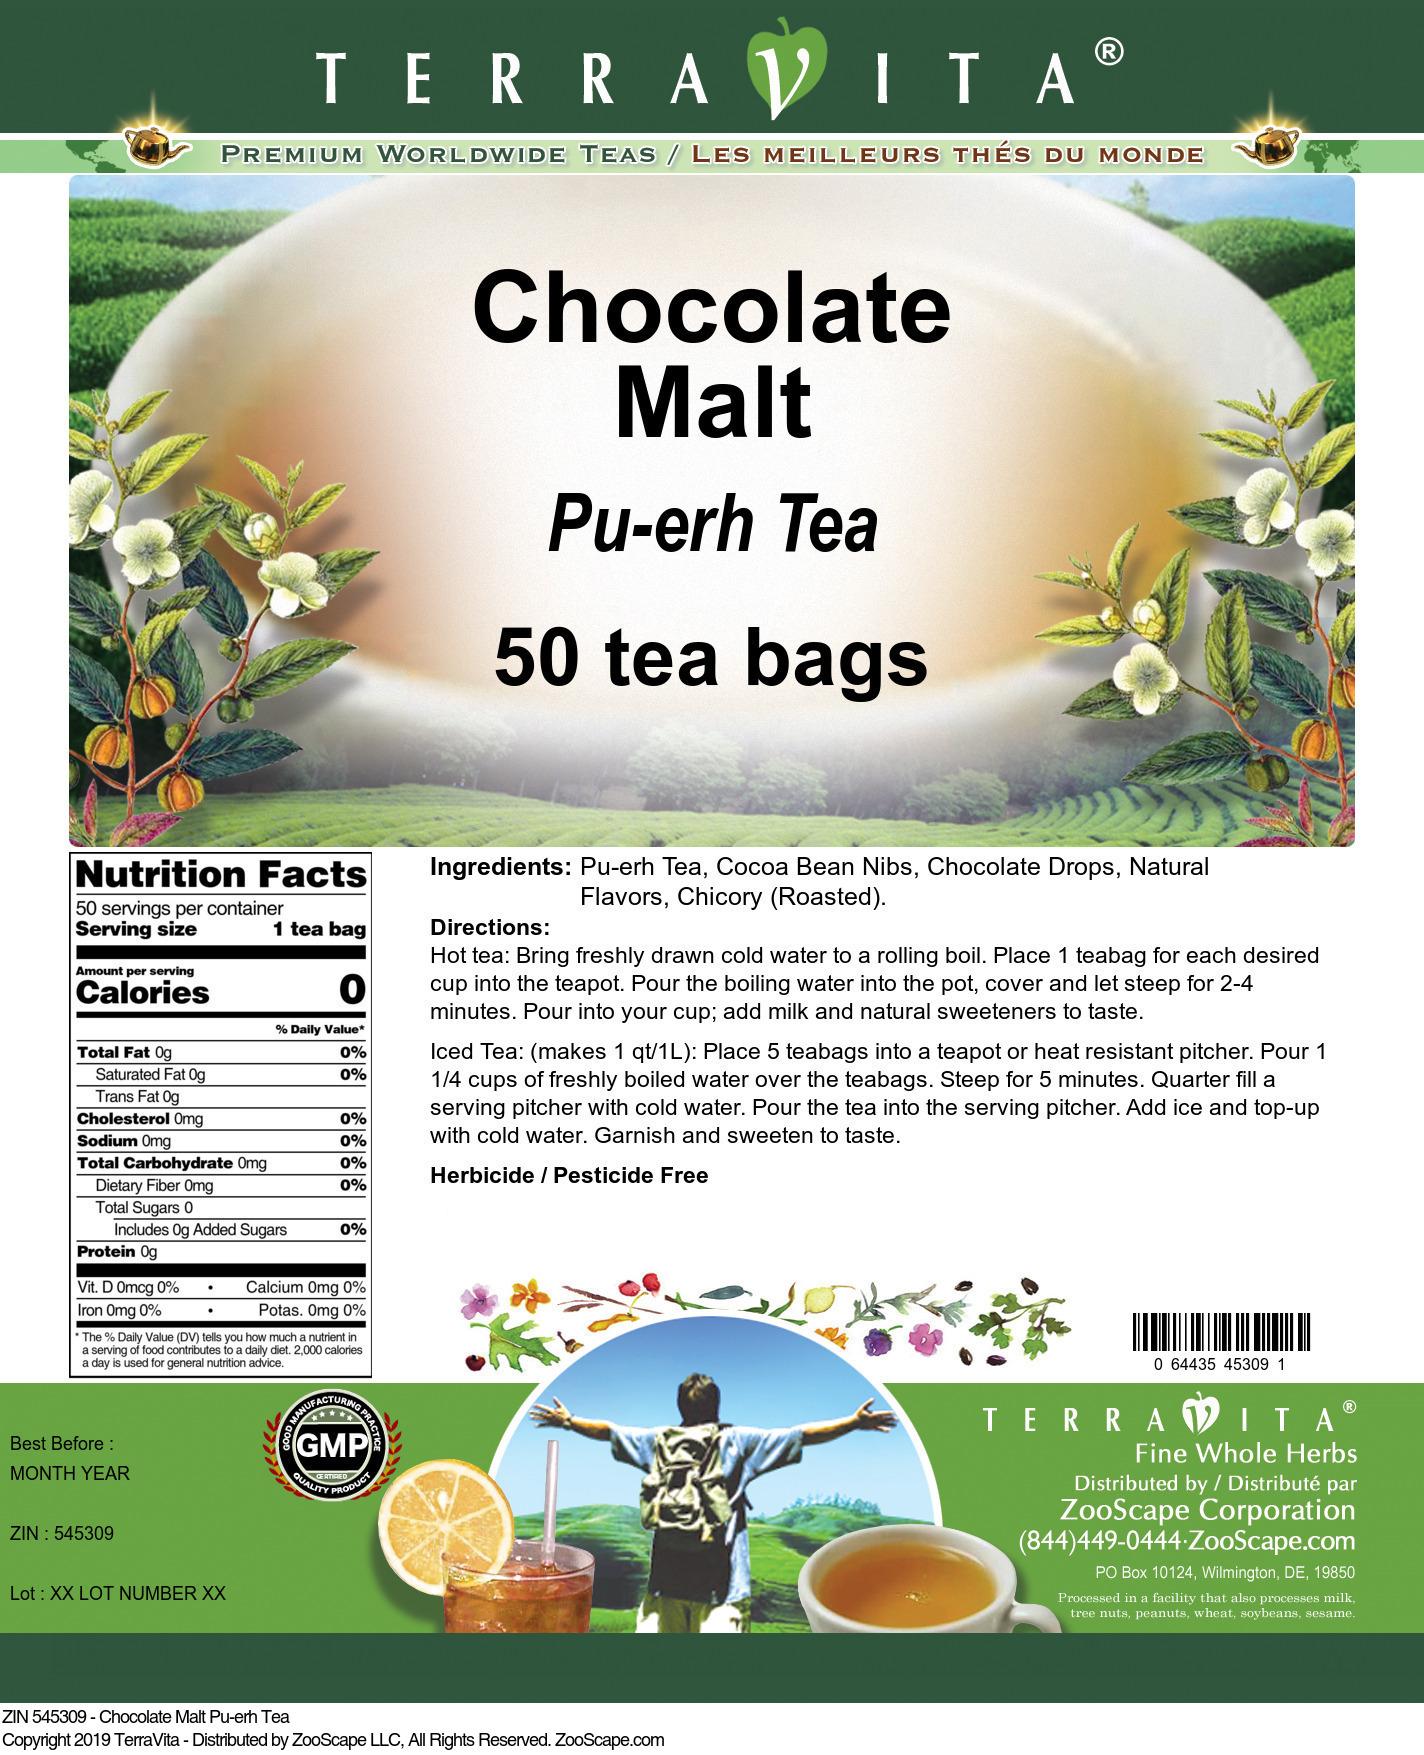 Chocolate Malt Pu-erh Tea